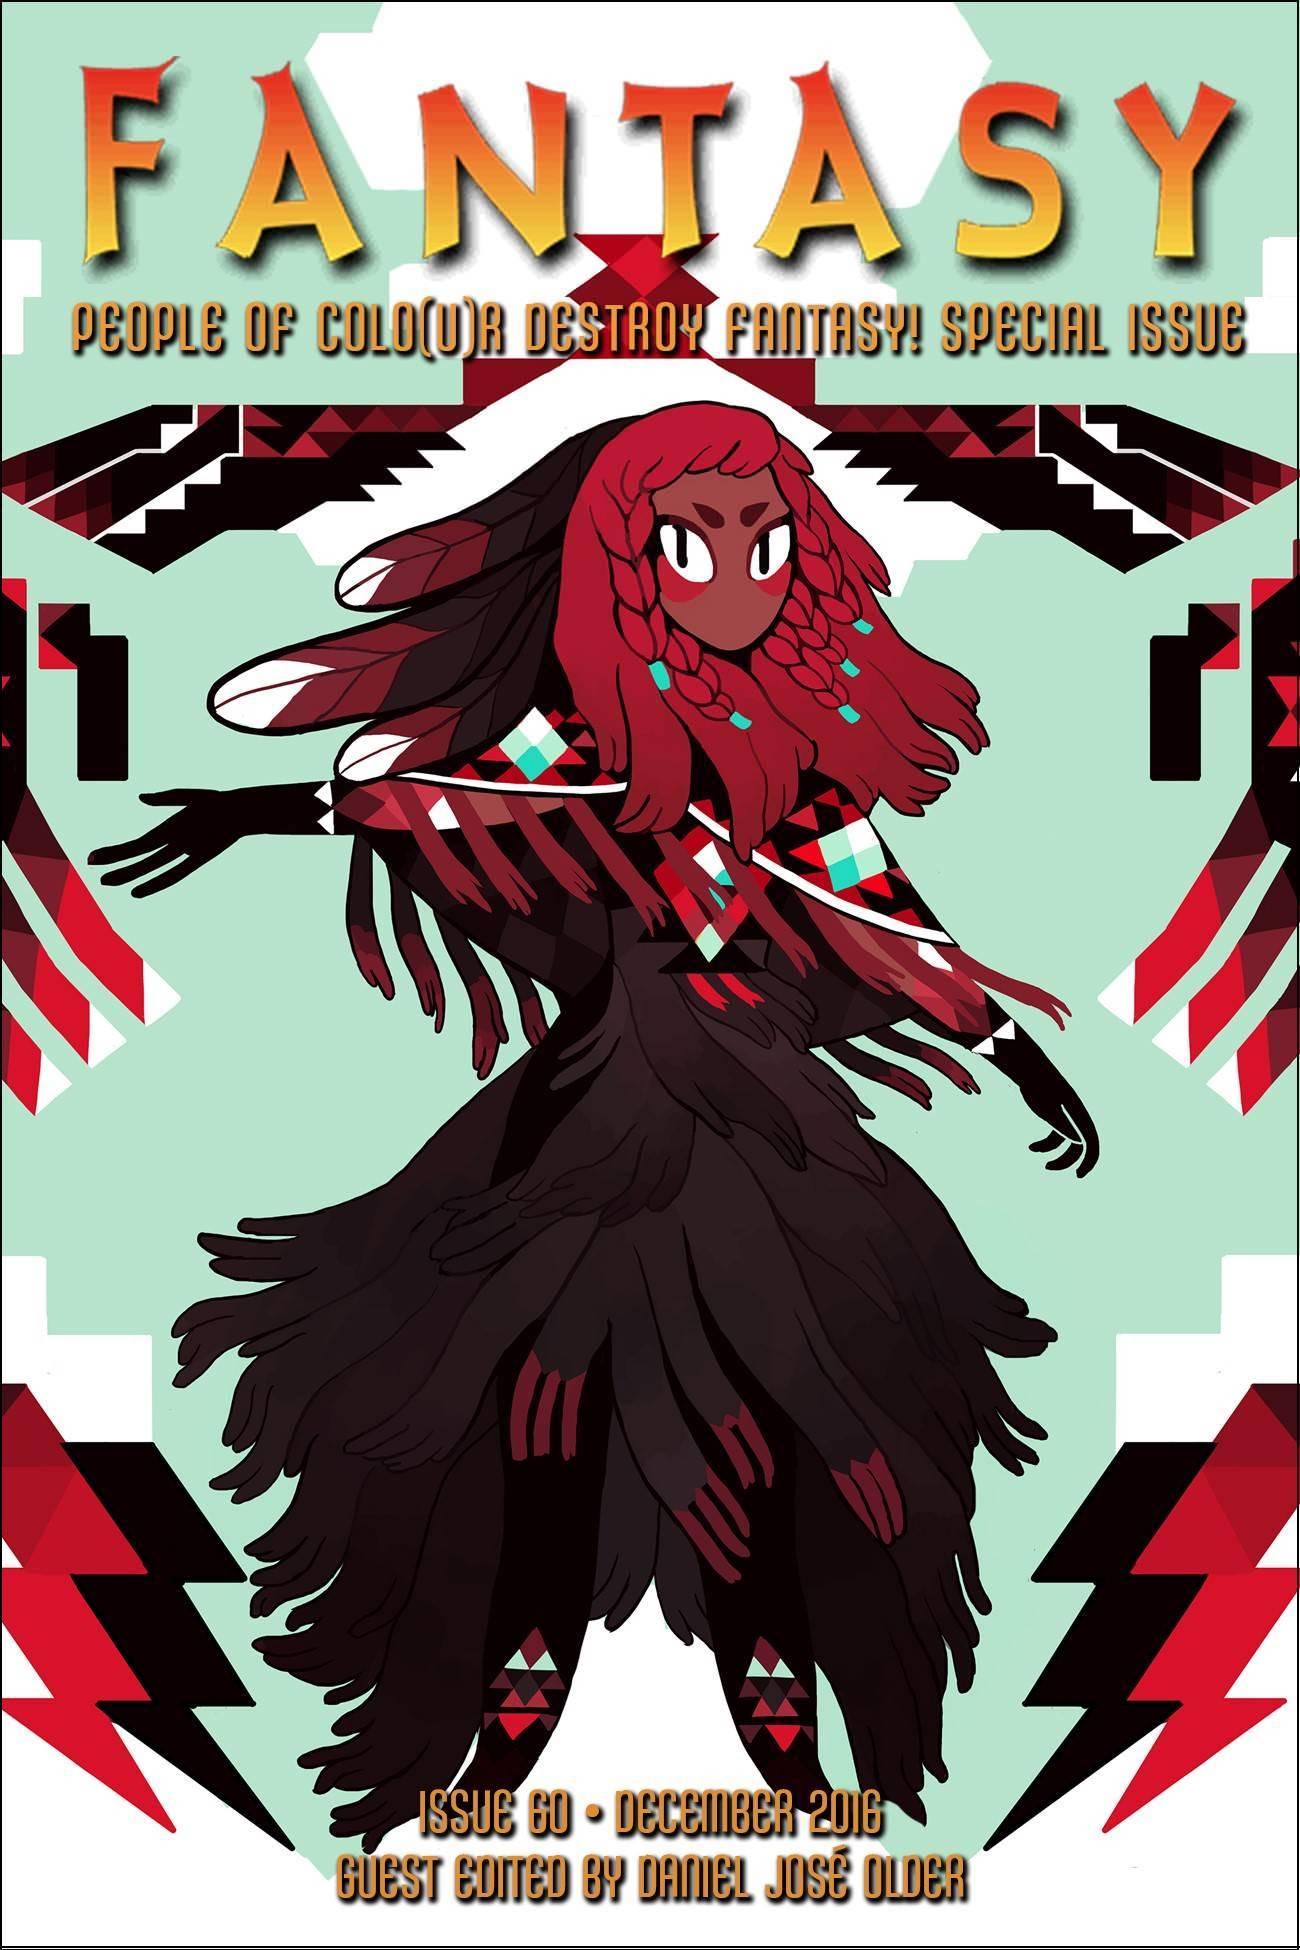 Fantasy Issue 60 - Dec. 2016: People of Colo(u)r Destroy Fantasy! Special Issue